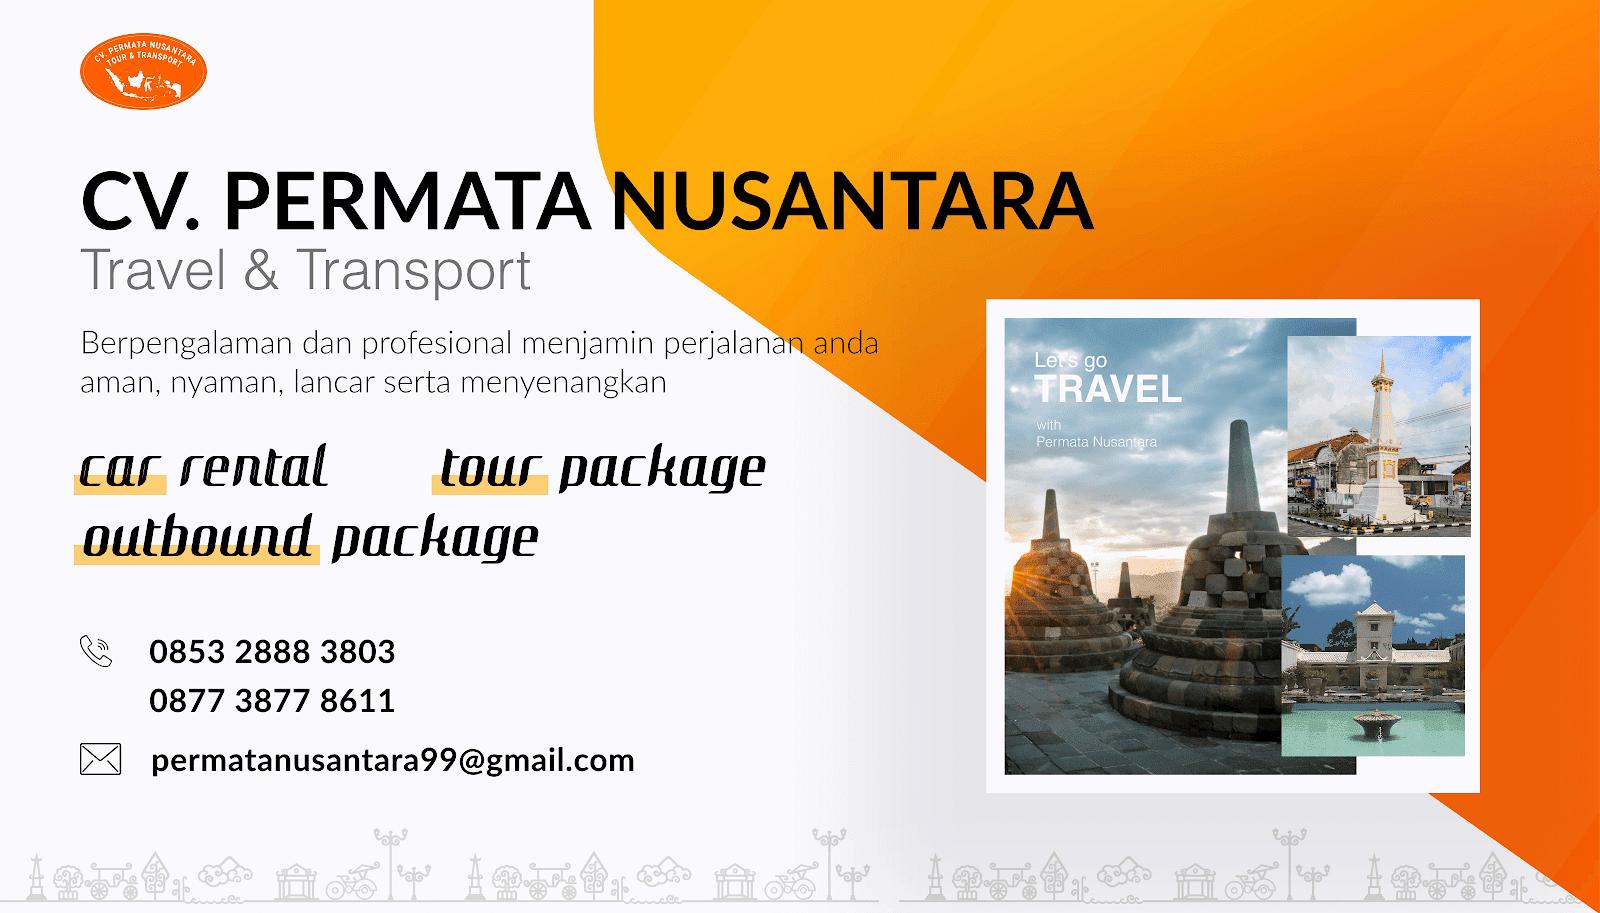 Harga Jual Tour Lebaran Best Of Usa Hingga 2 Juta Termurah 2018 Background Foto Manasik Haji 25x3m Nusantara Dan Travel Yogyakarta Permata Transport